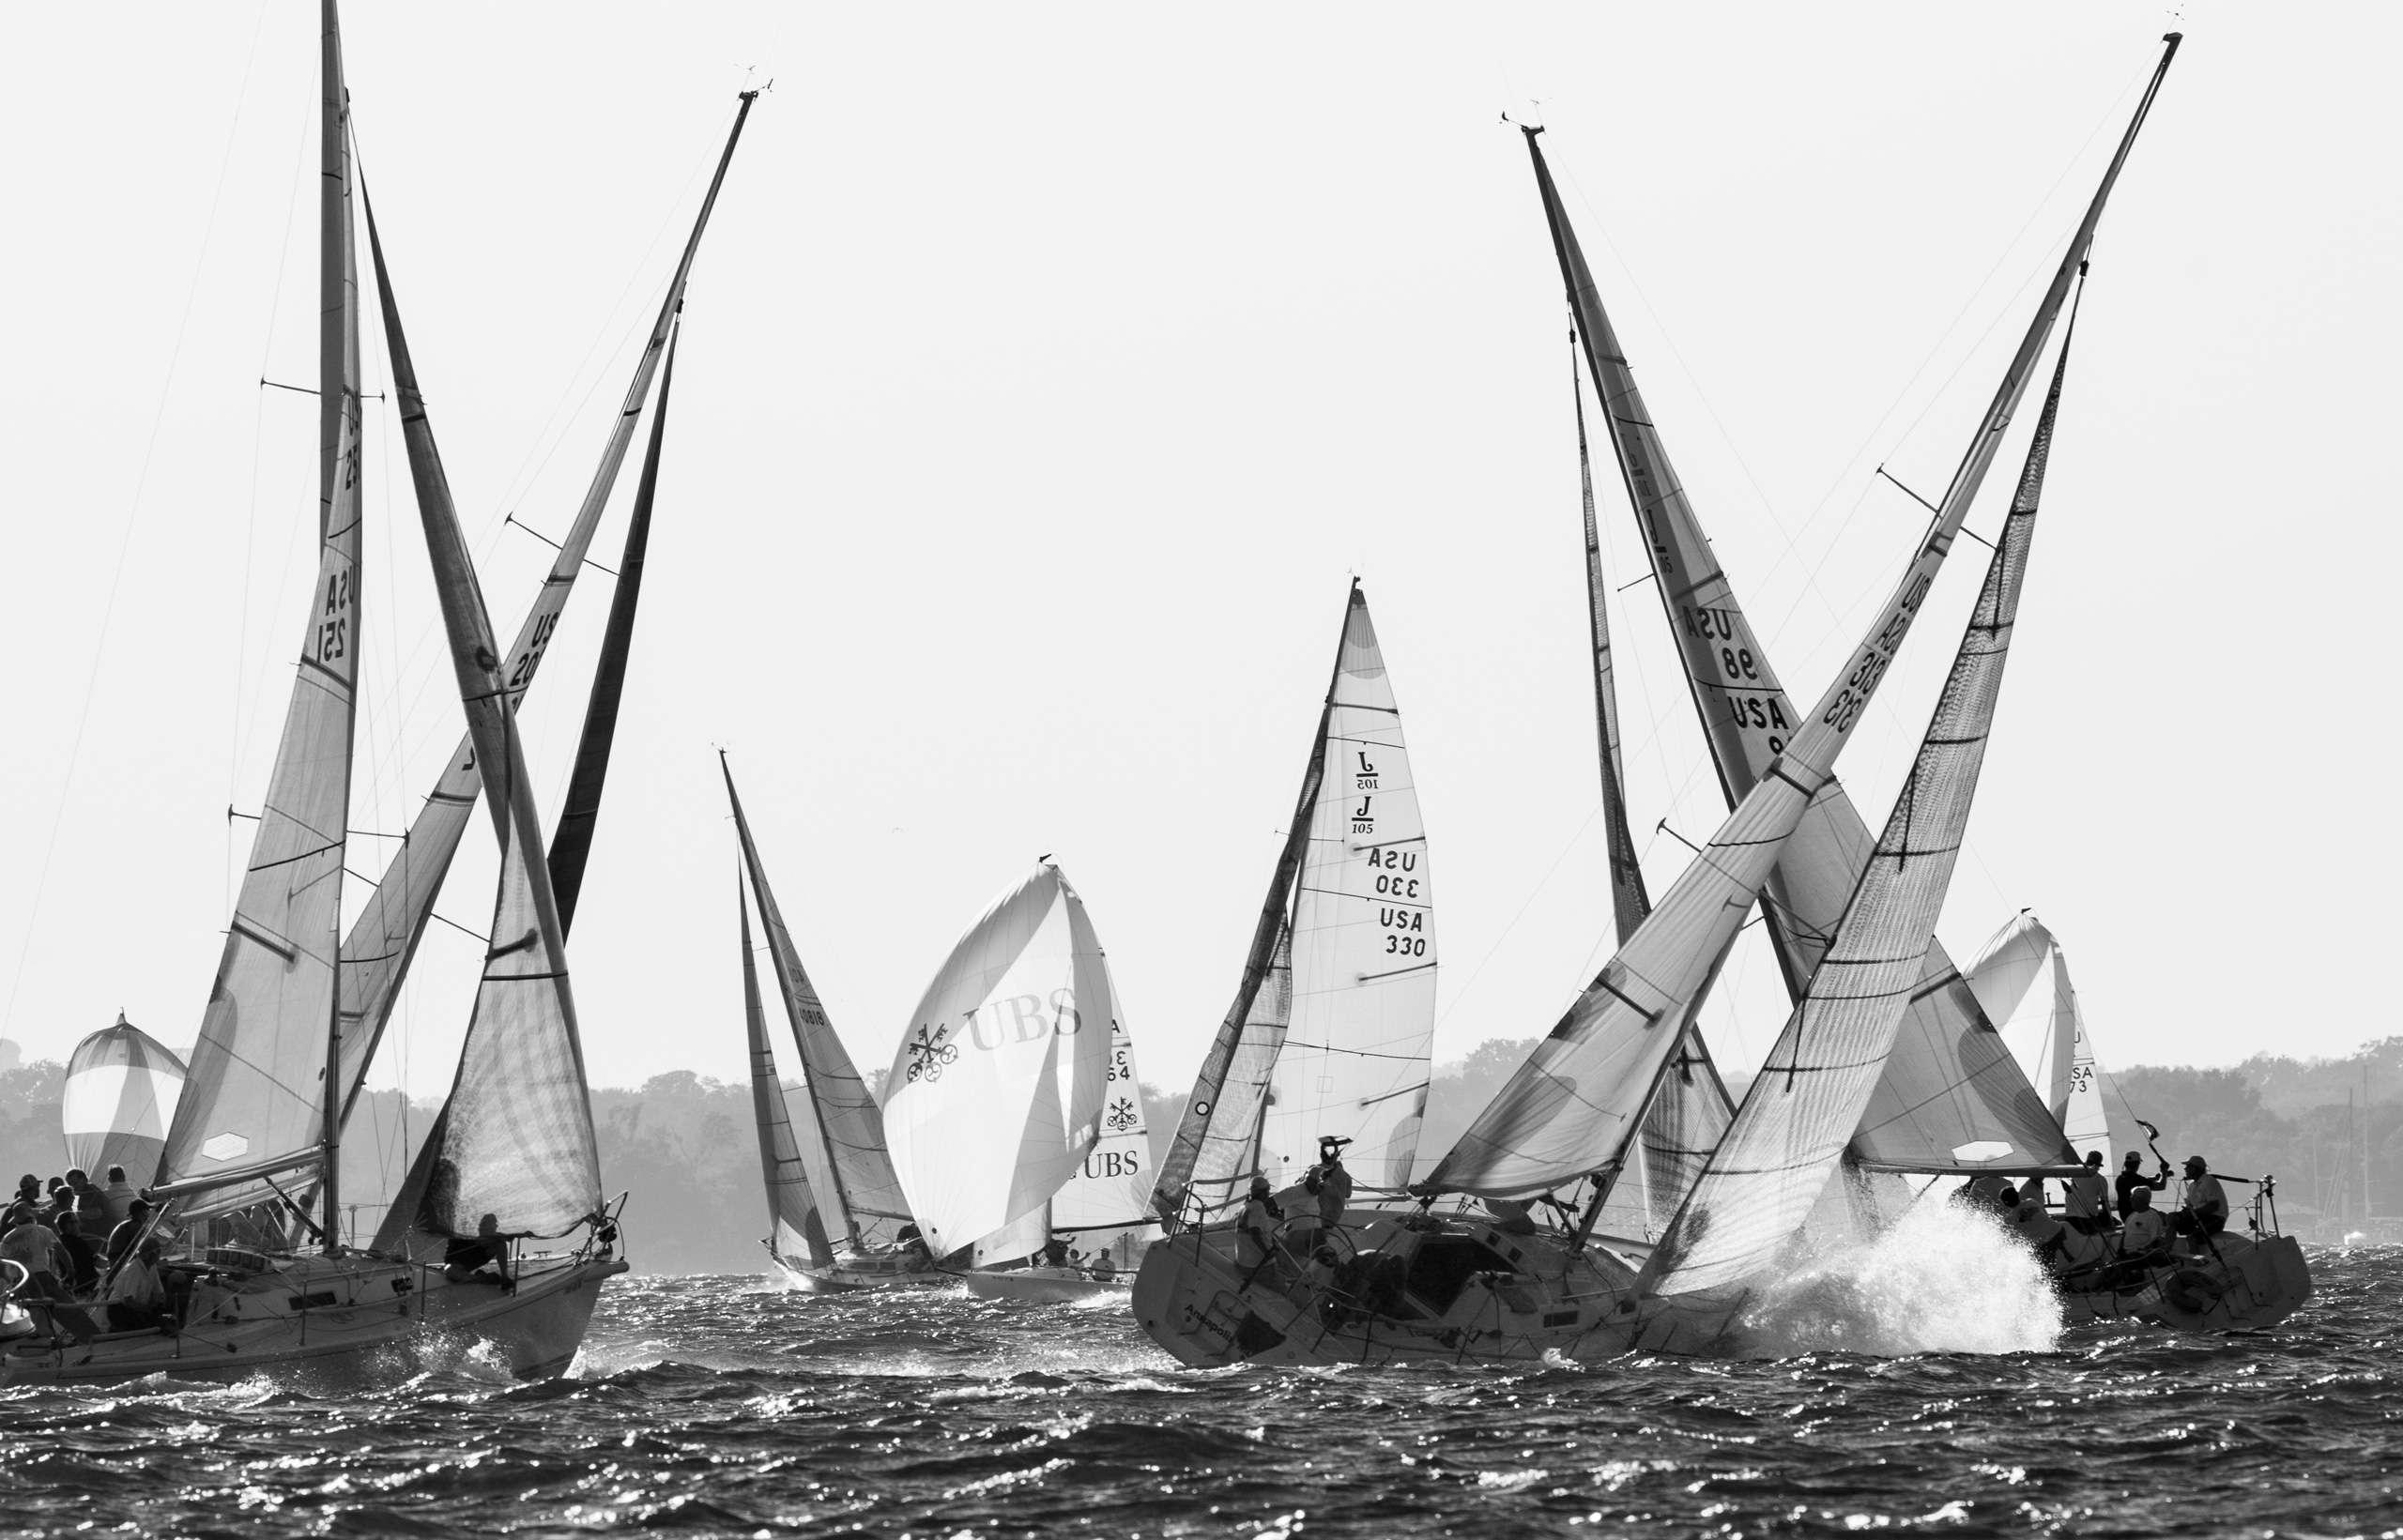 PORTFOLIO - Sailing - Chesapeake #11